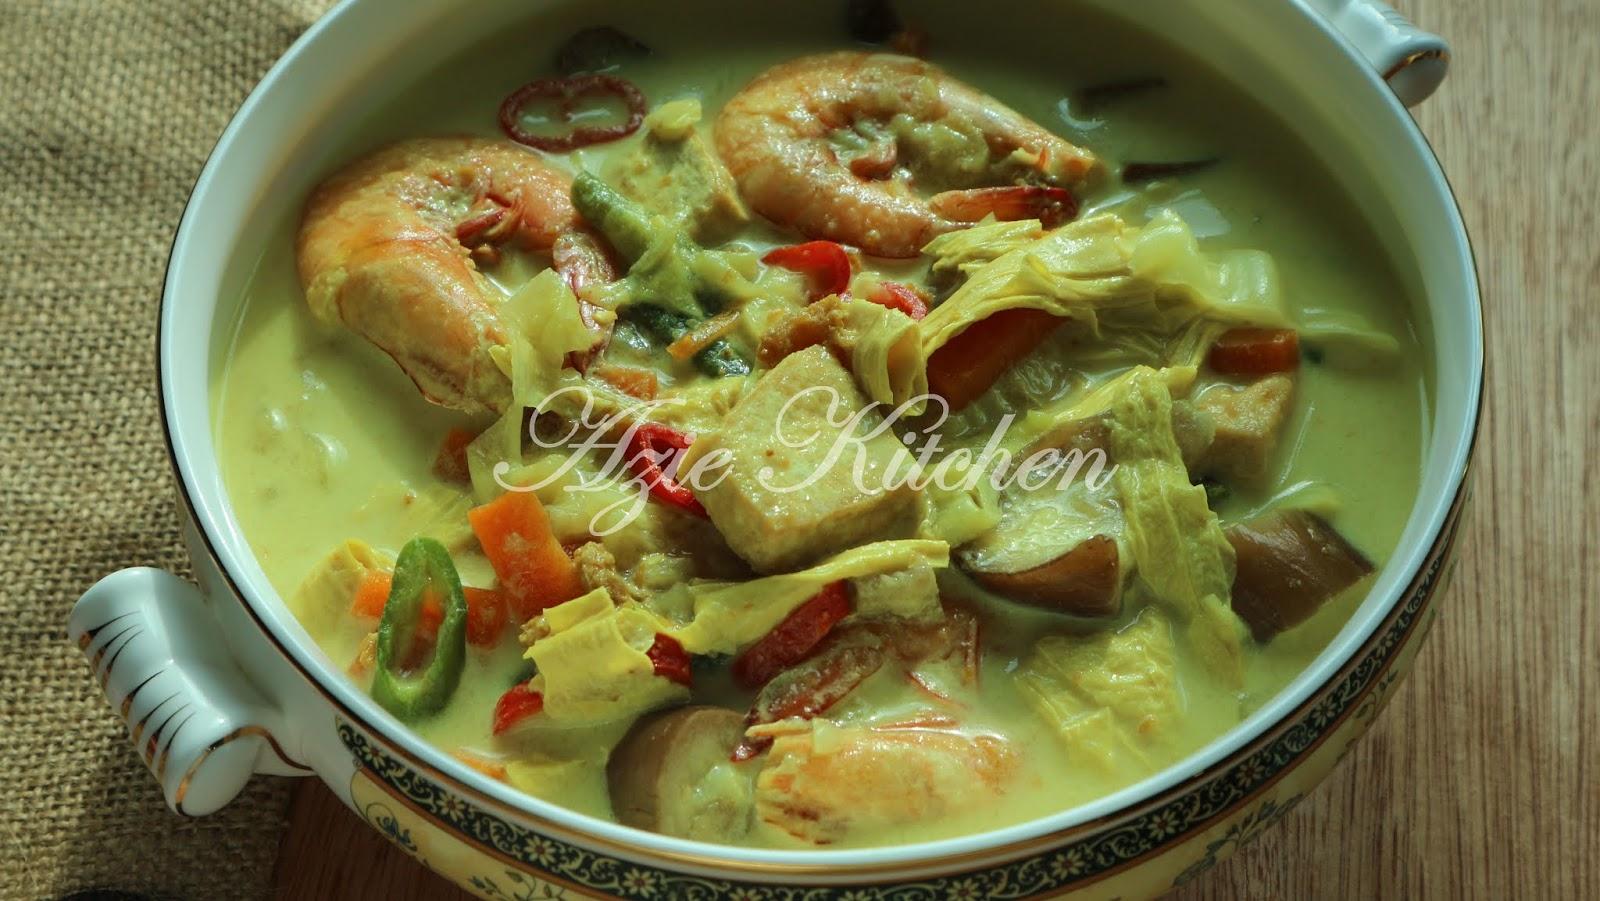 Lontong Dan Kuah Lodeh Azie Kitchen Yang Paling Sedap Azie Kitchen